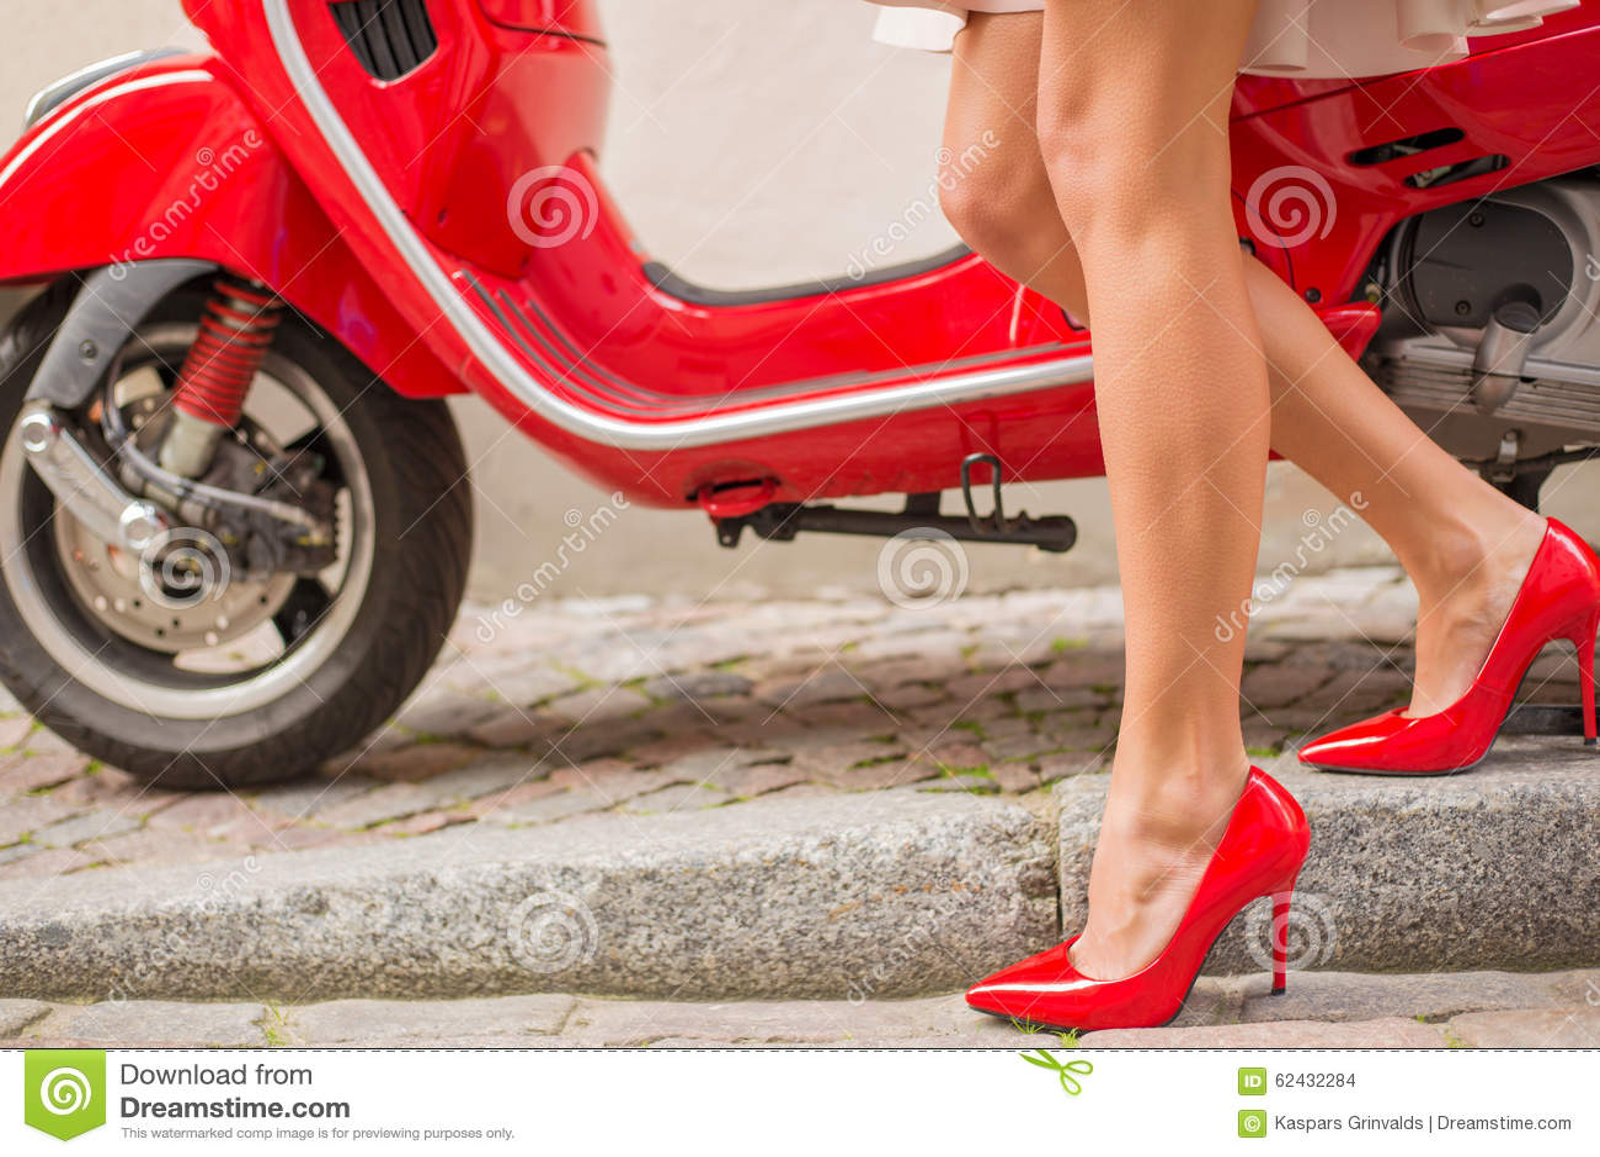 Red Shiny High Heels